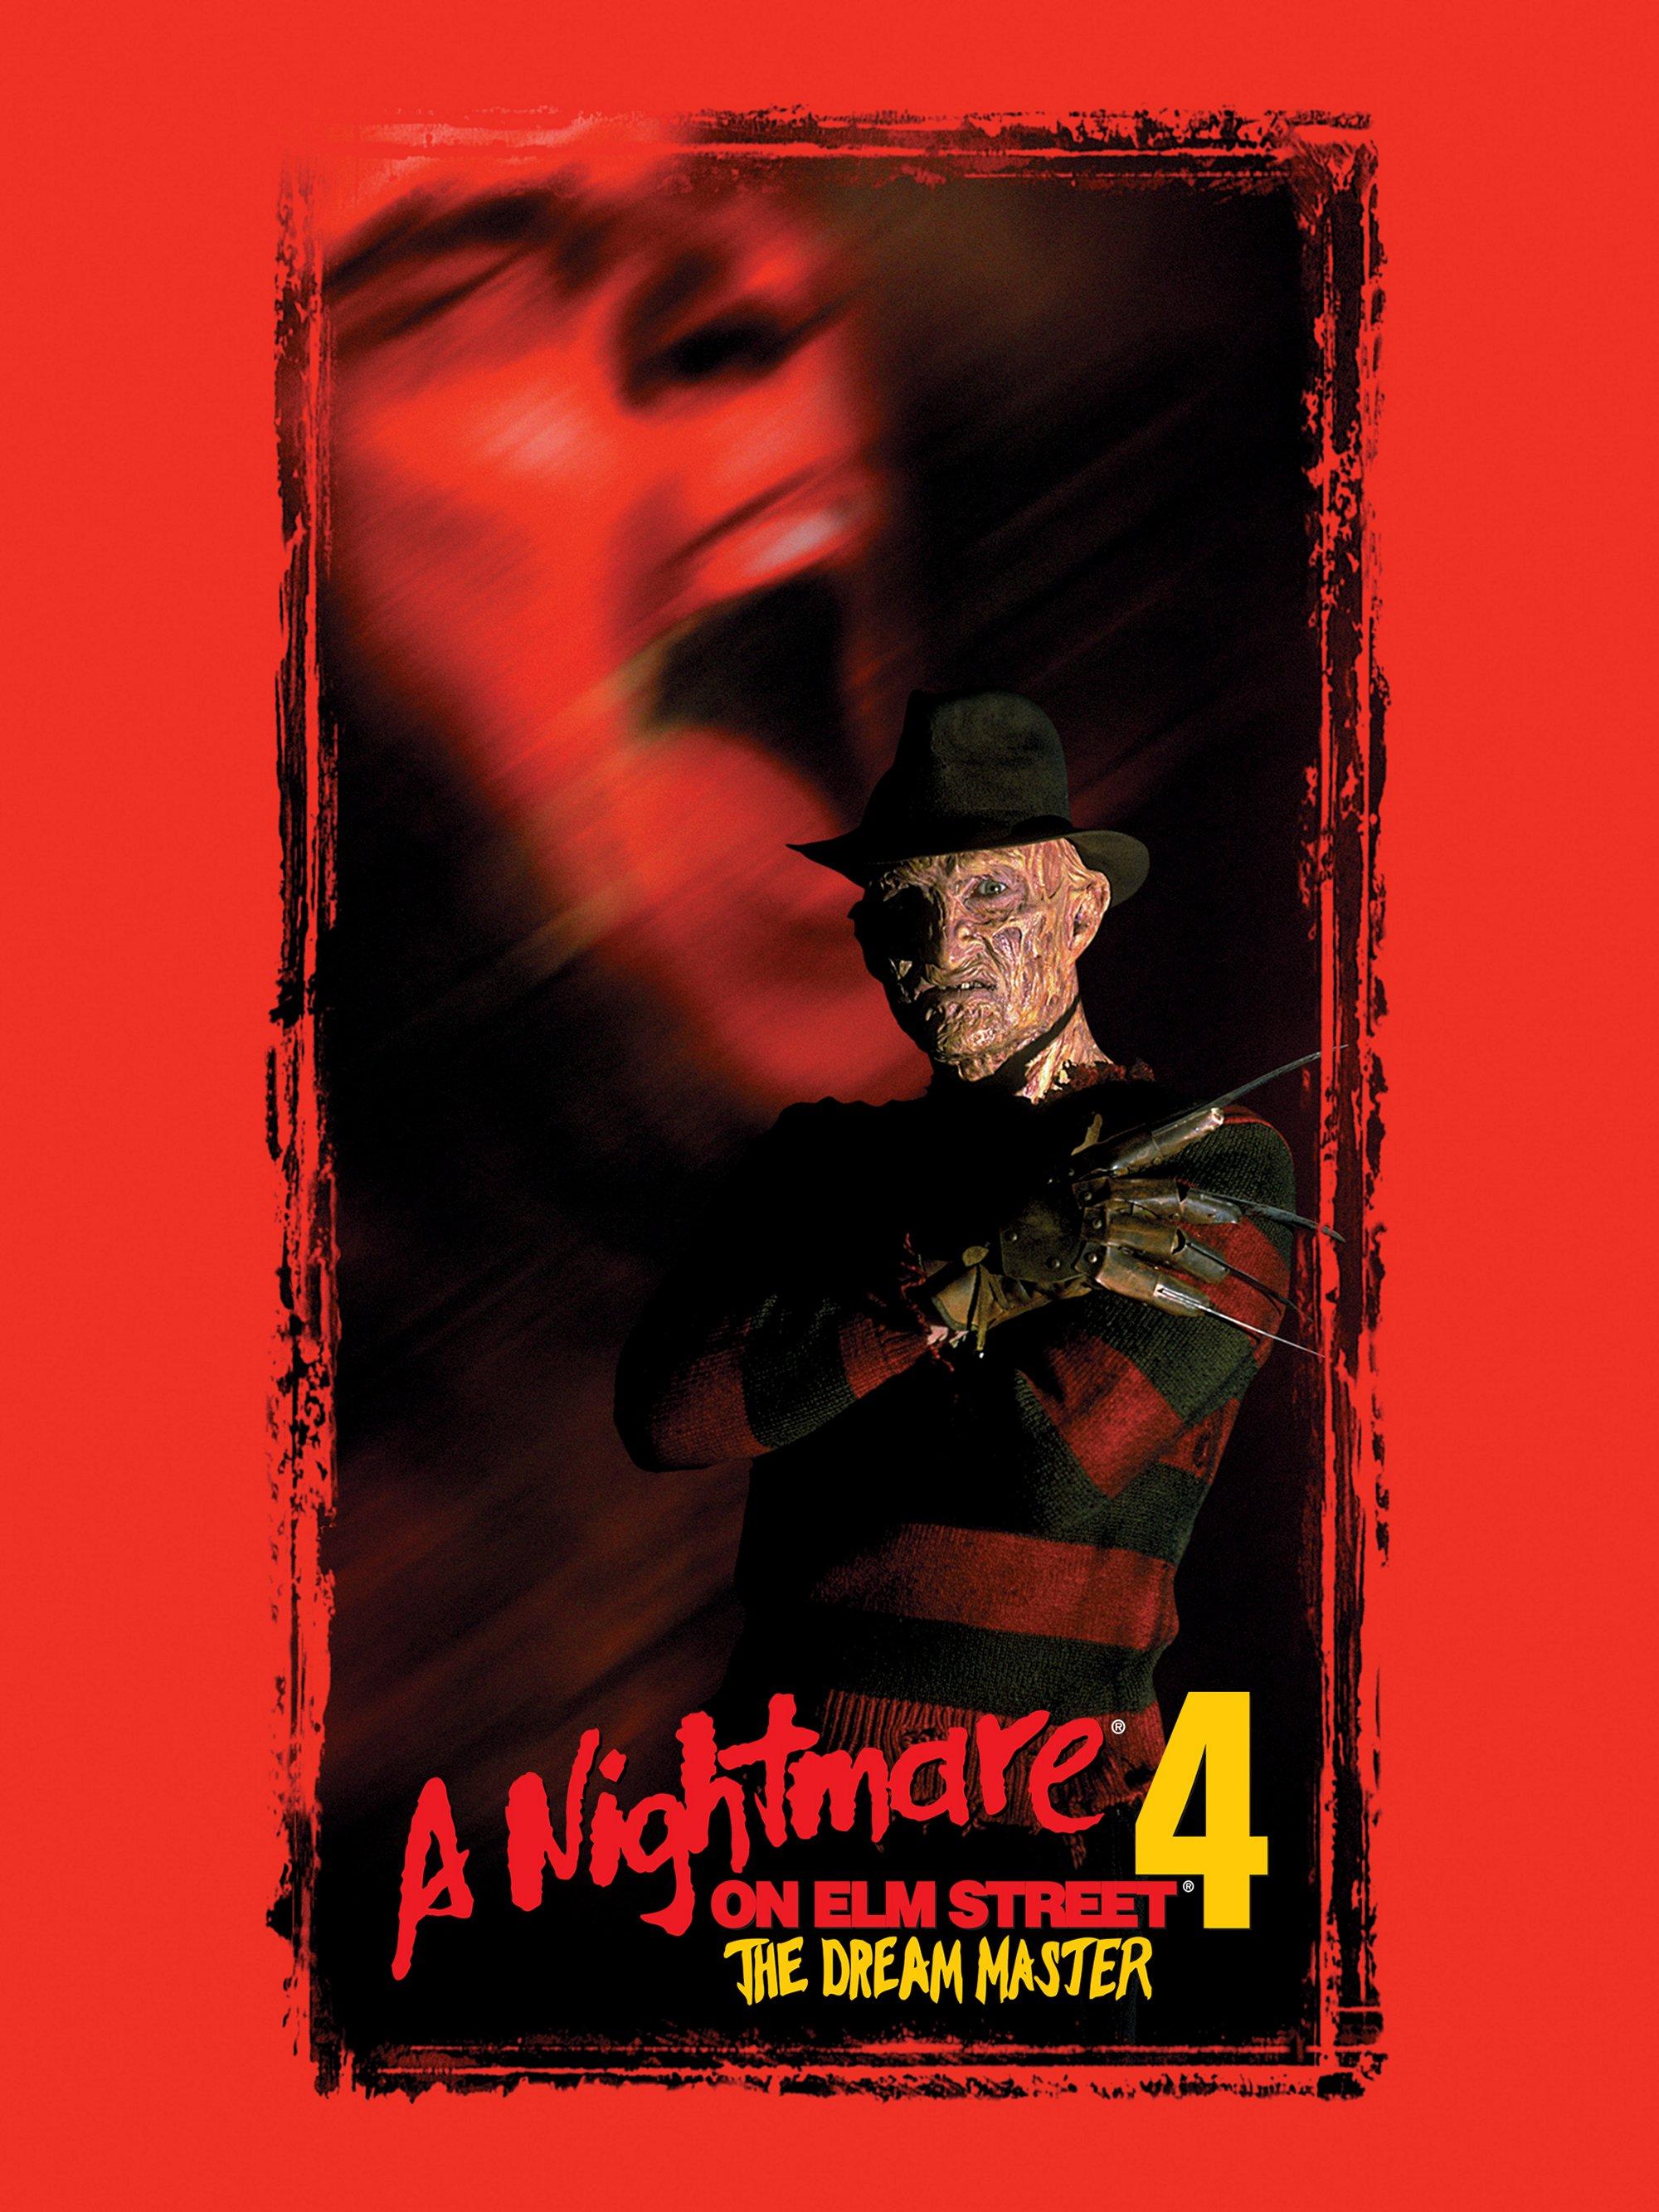 A Nightmare on Elm Street 4: The Dream Master